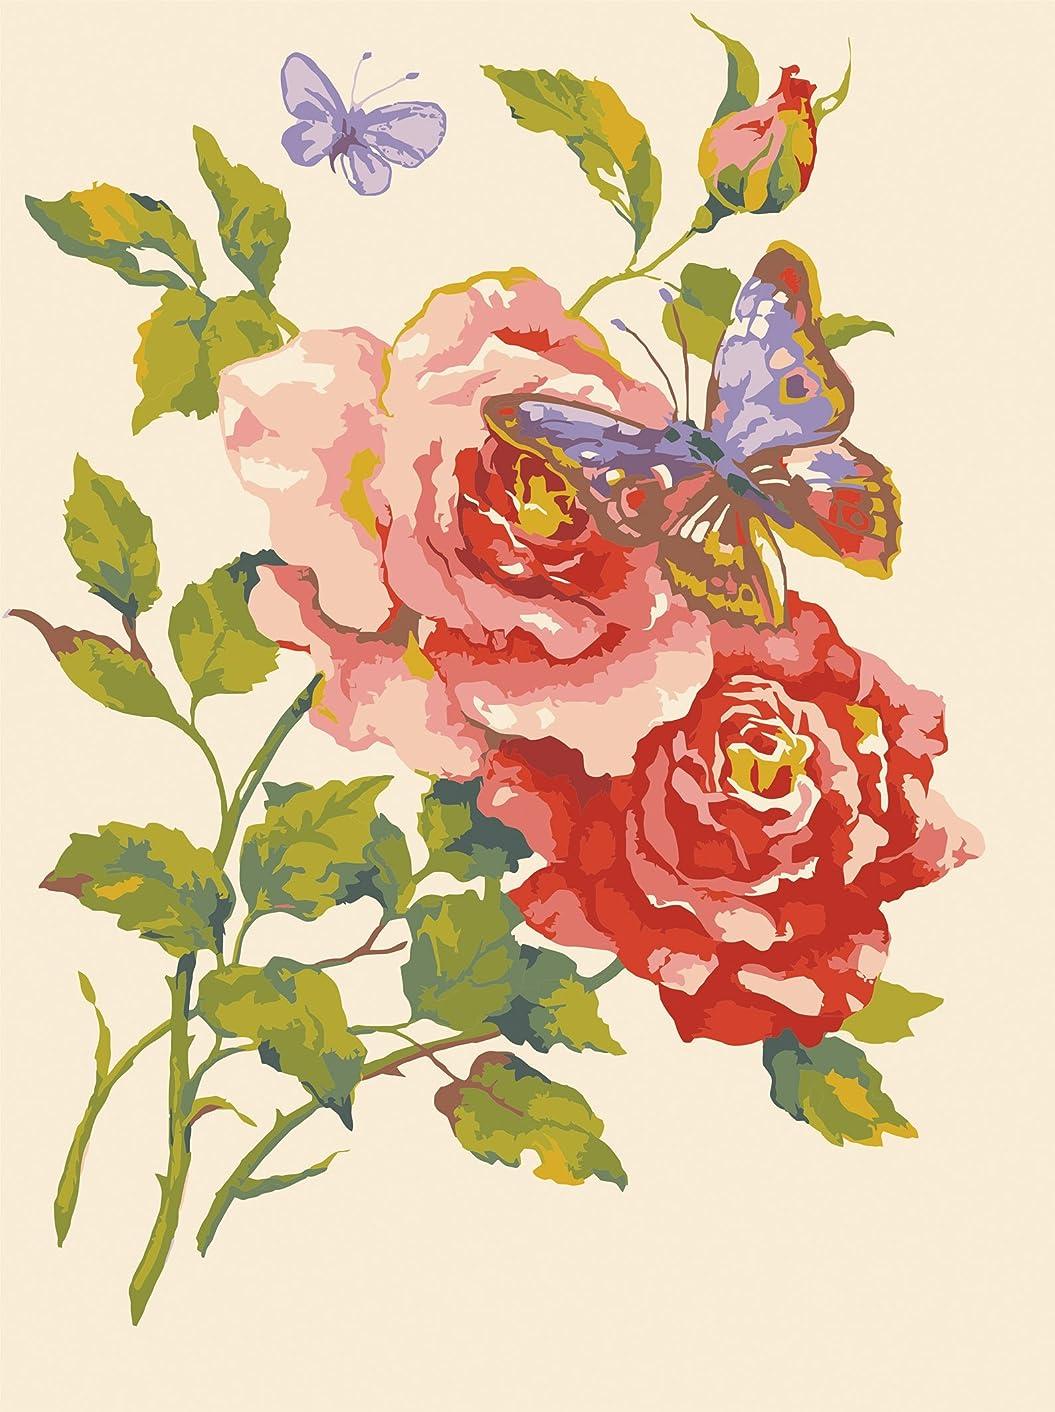 Needlepoint Painted Canvas Cross Stitch Tapestry Kit Gobelin - Flowers. 16